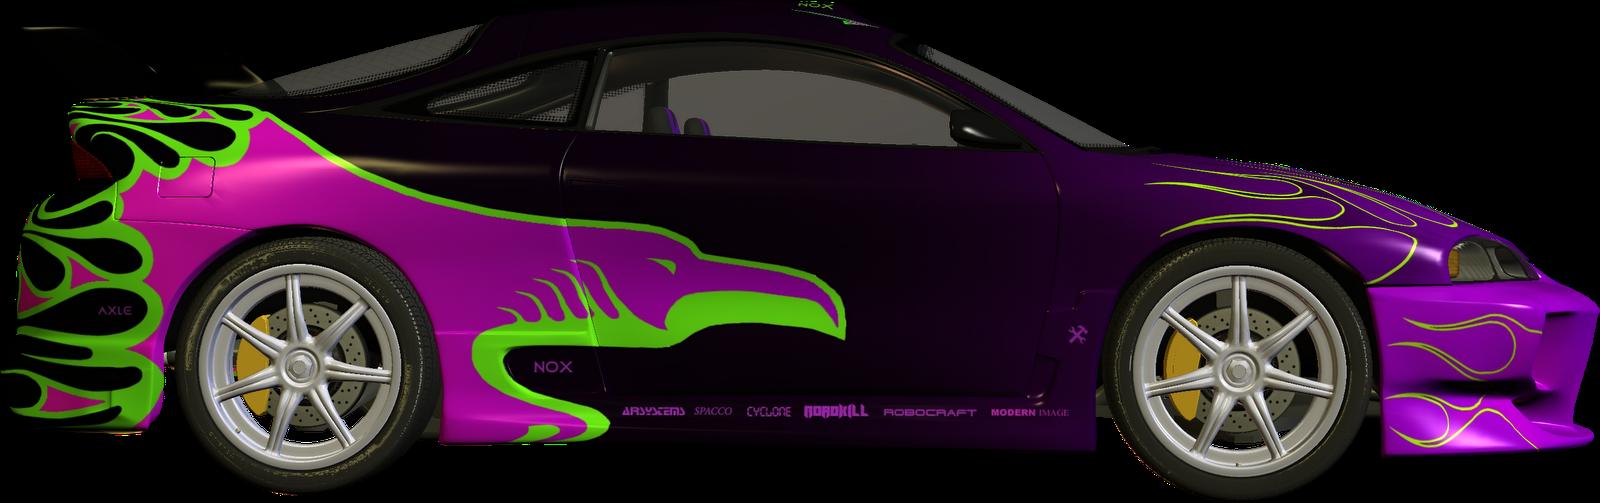 Race Car clipart Clipart car cliparts Clipartix Race